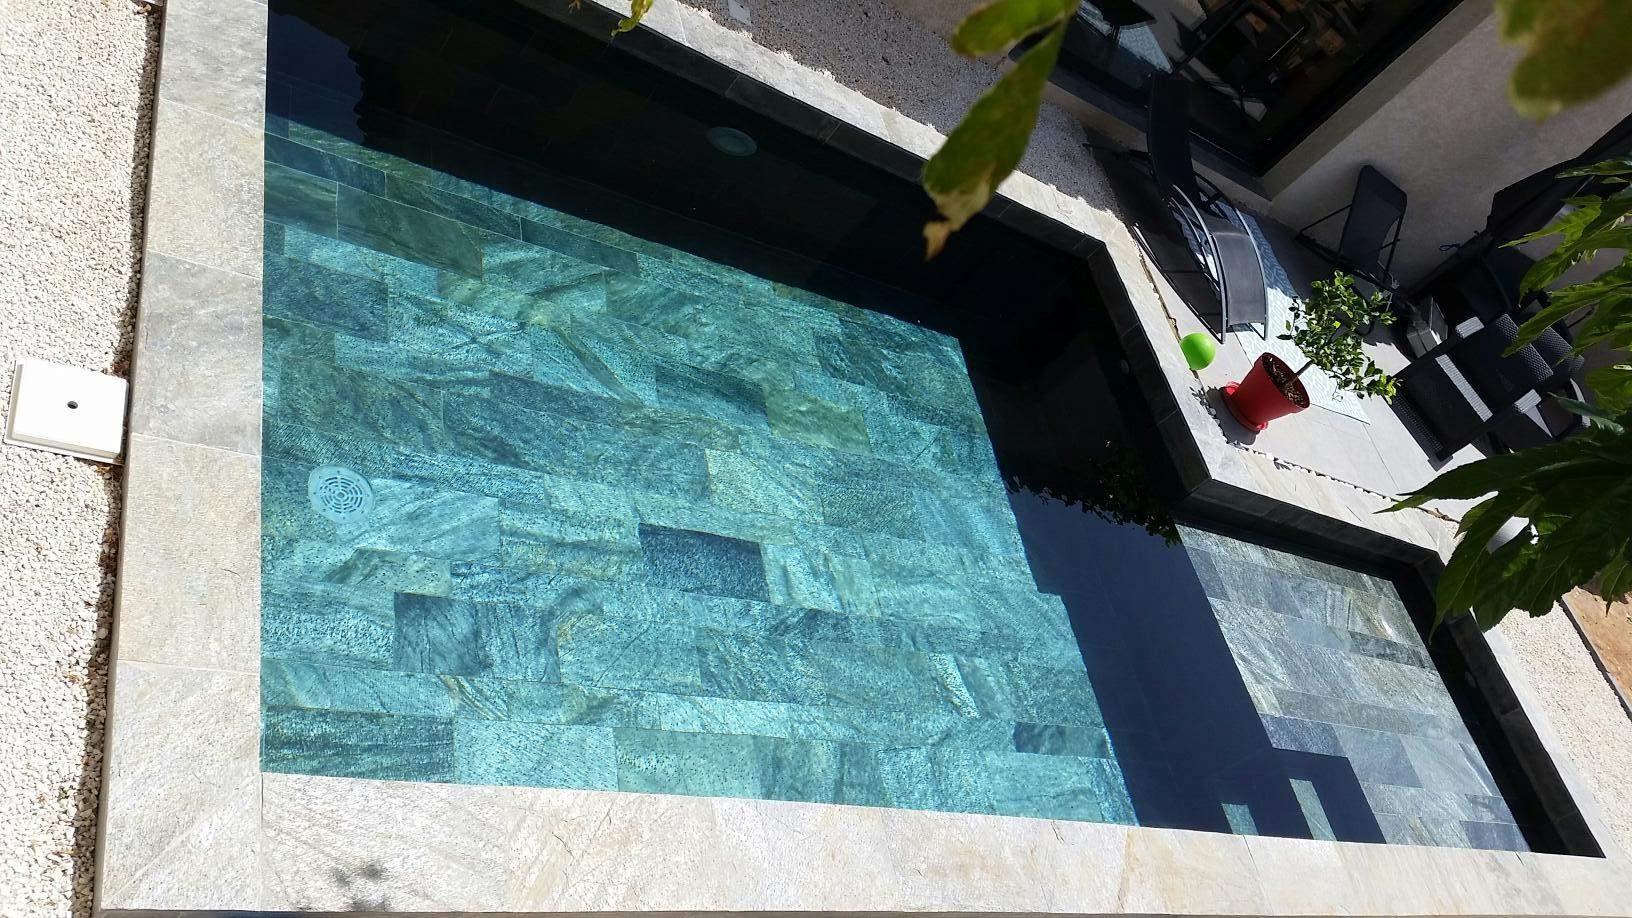 Piscine Beton Avec Plage Immergée faq piscines en pierre naturelle